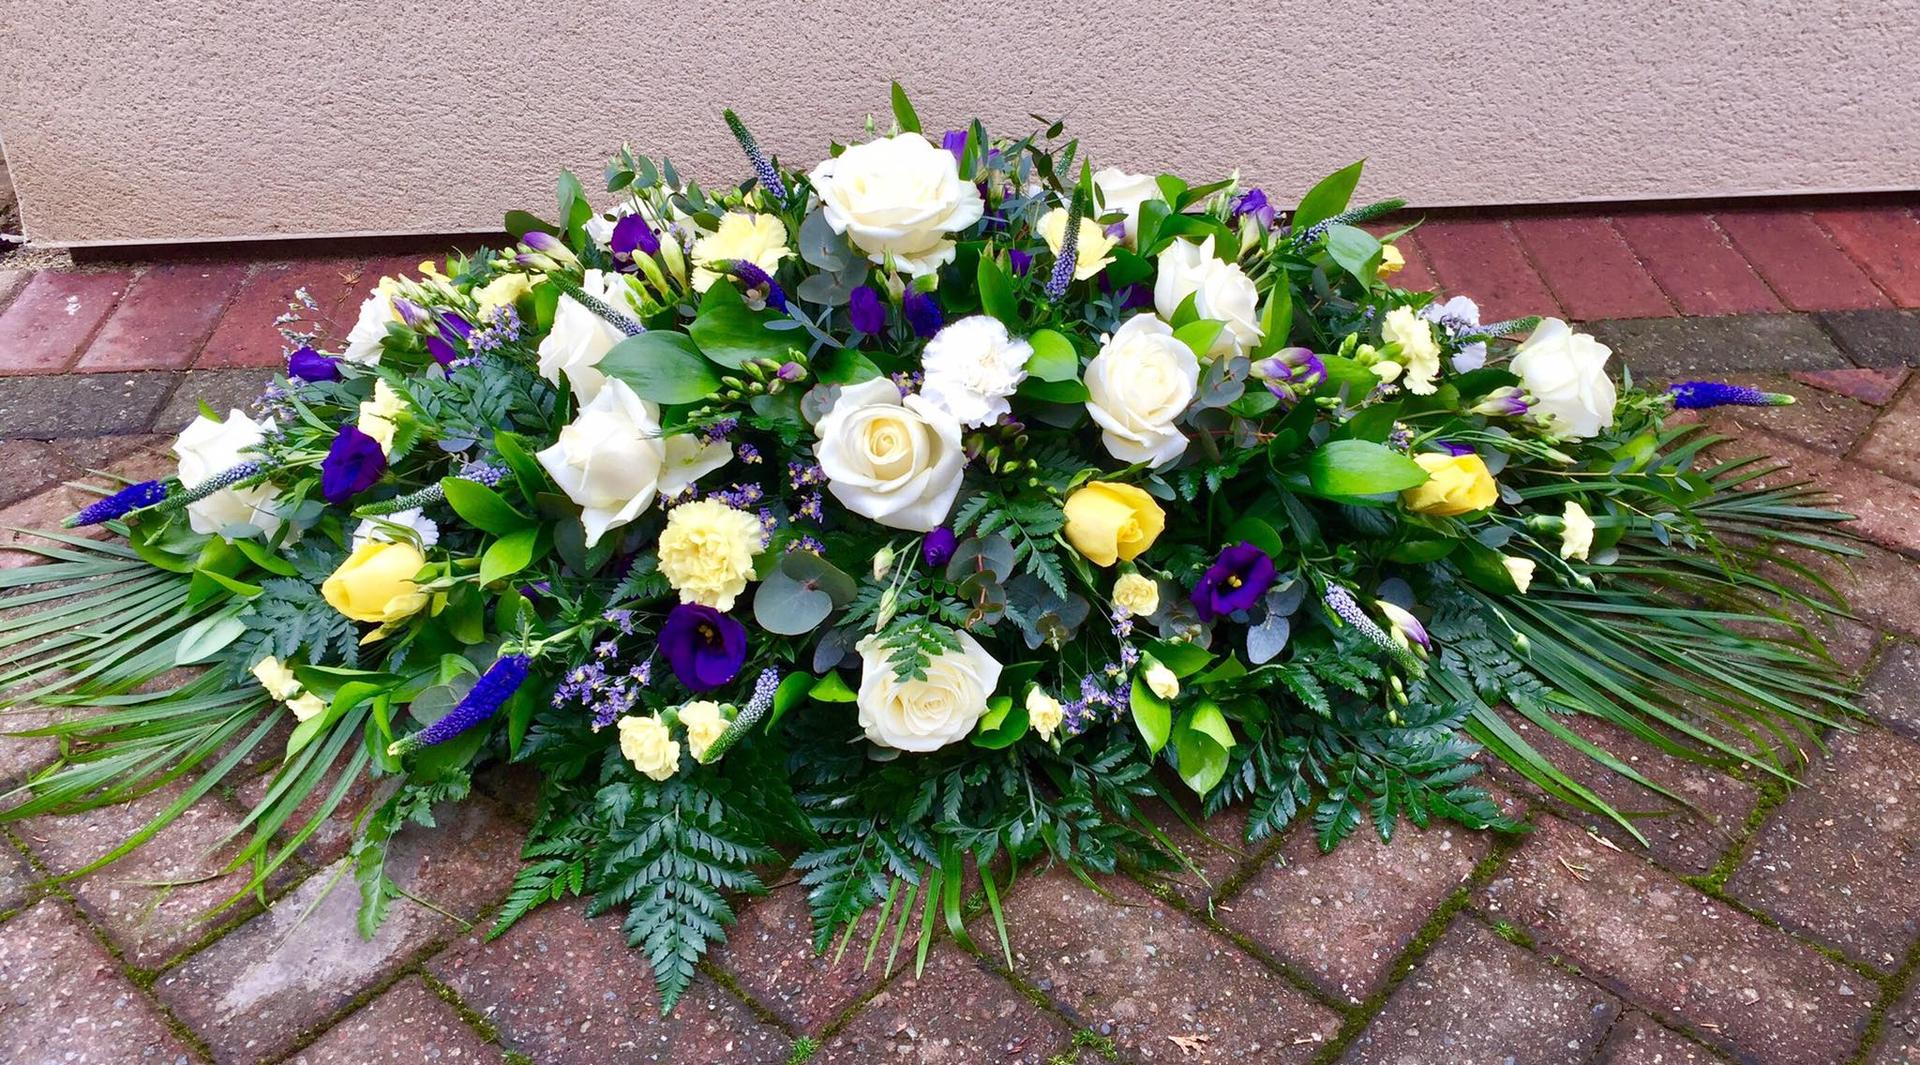 La Beau Fleurs Funeral Florist Funeral Flowers